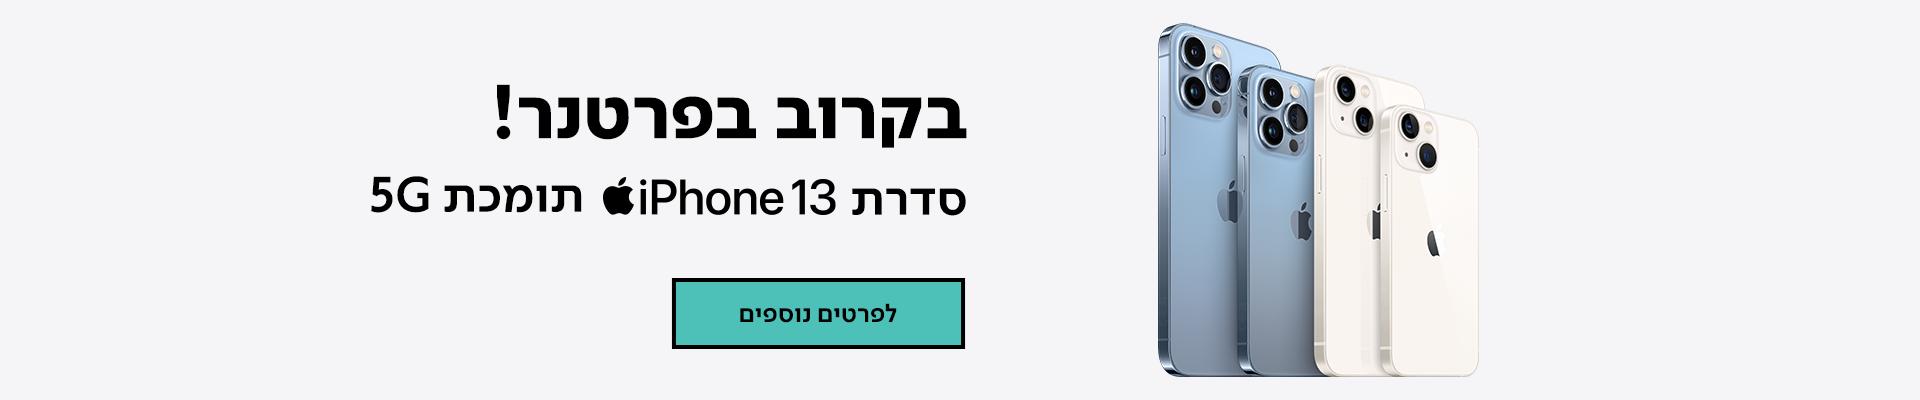 Partner Iphone13 Banner 1920X400